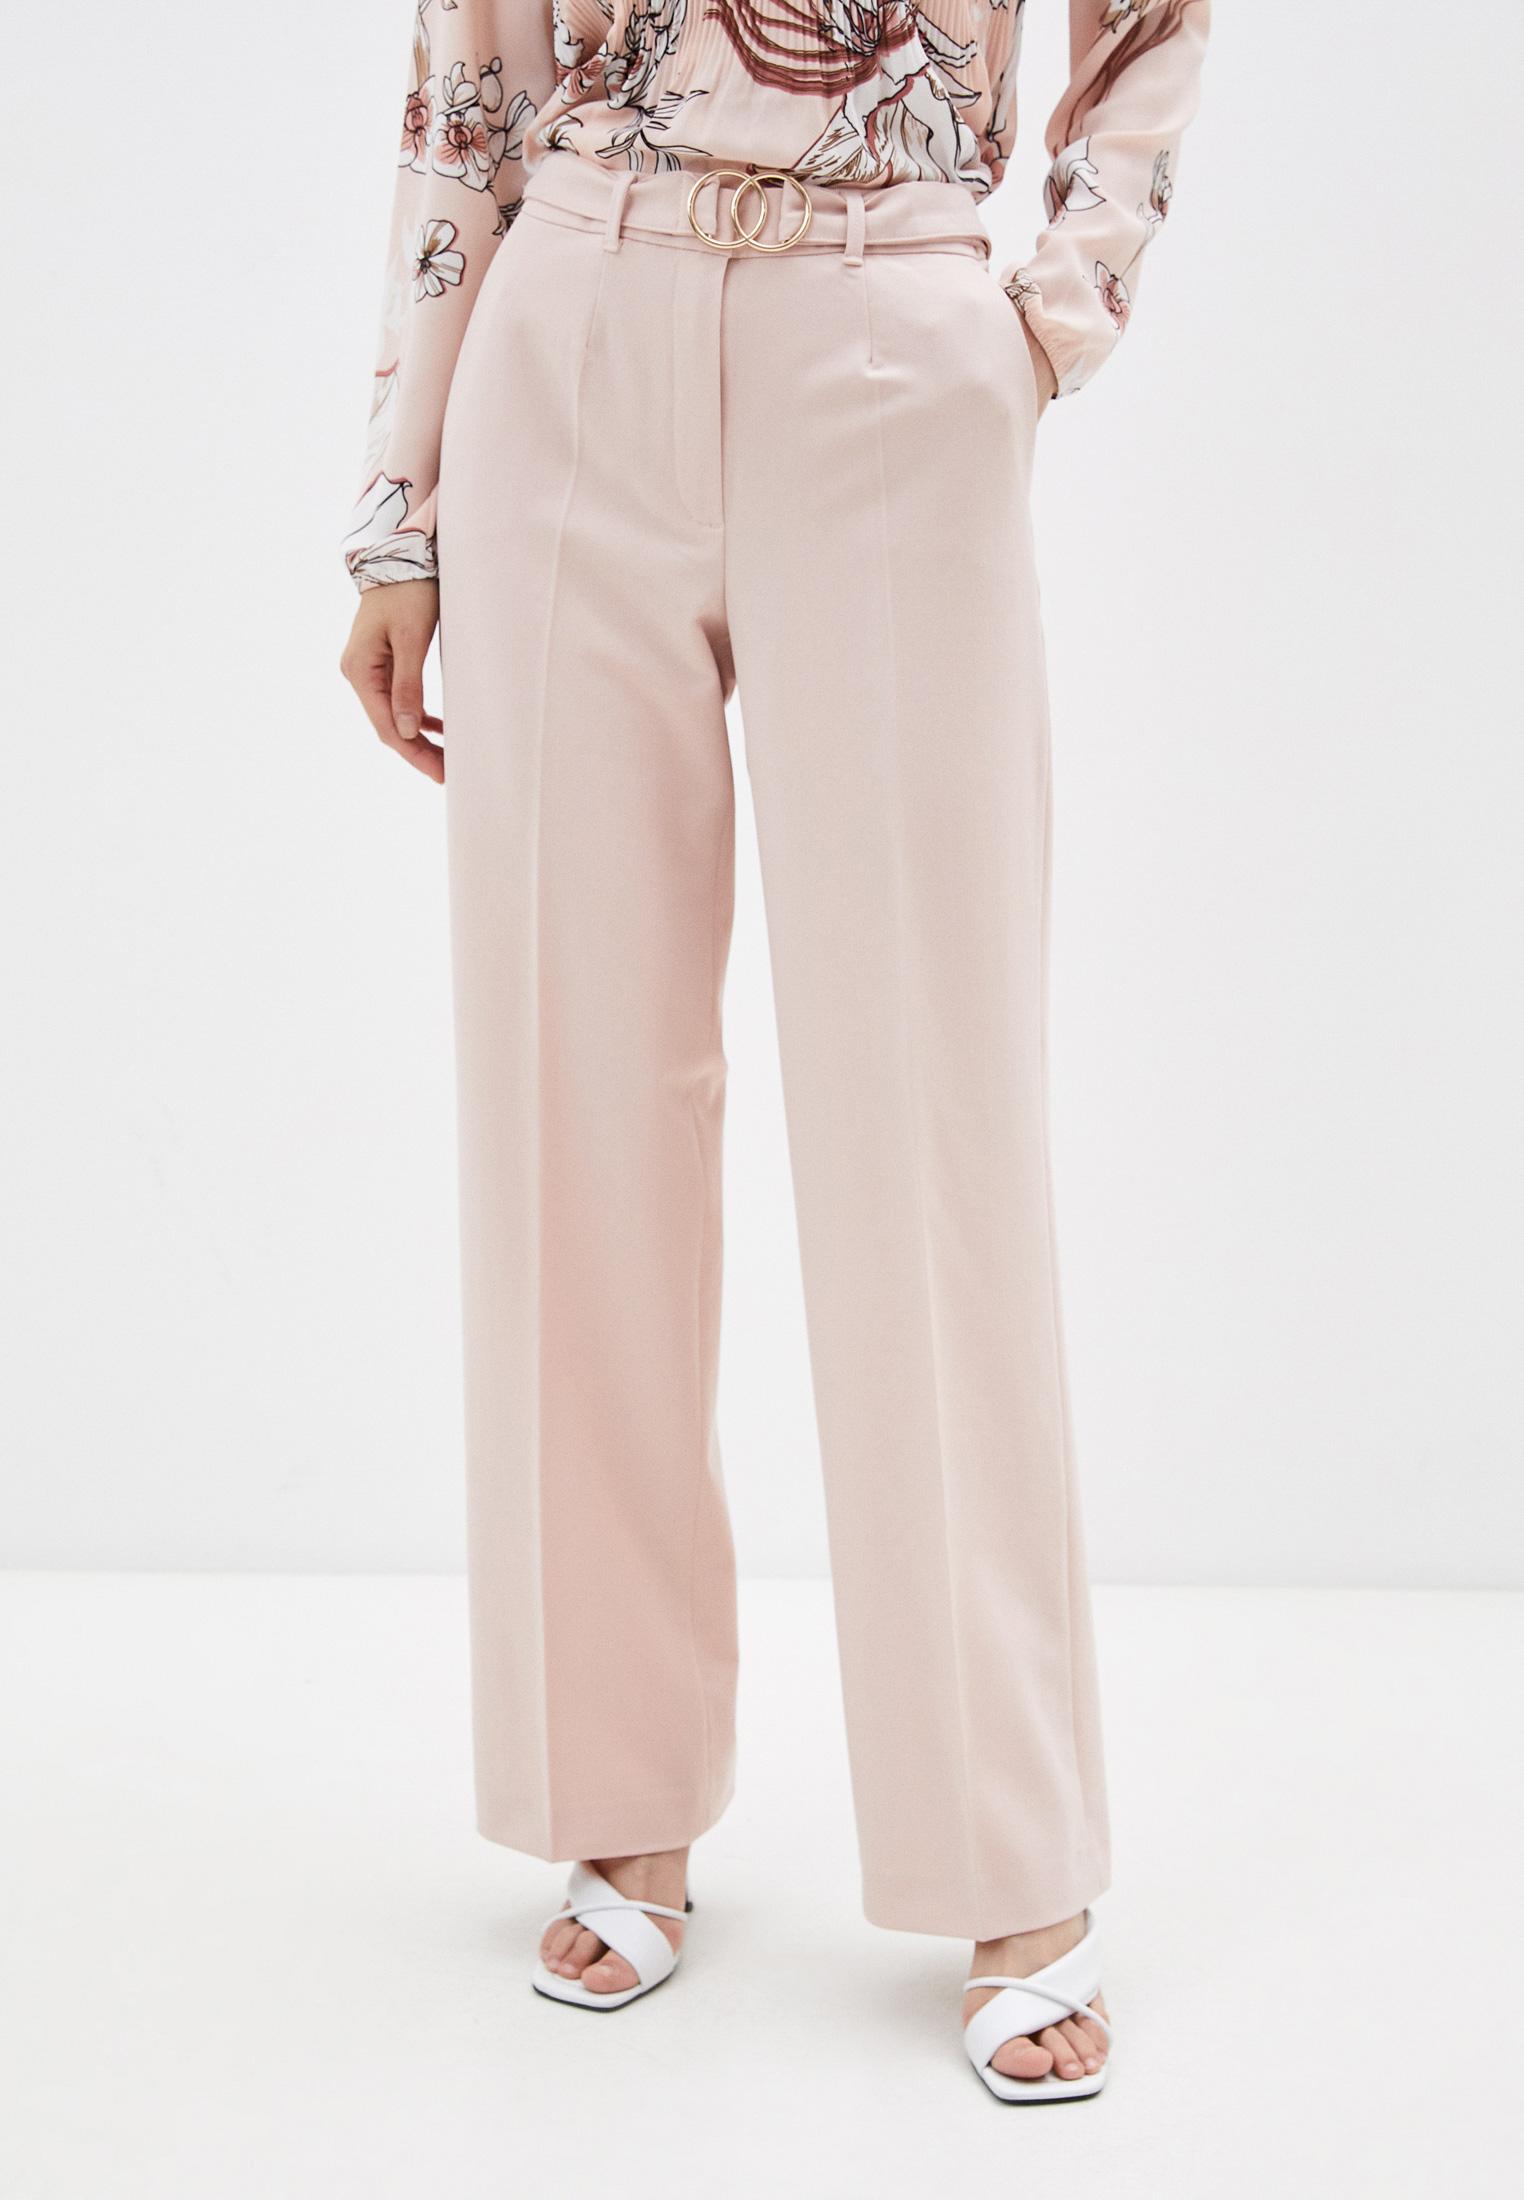 Женские прямые брюки Betty Barclay Брюки Betty Barclay